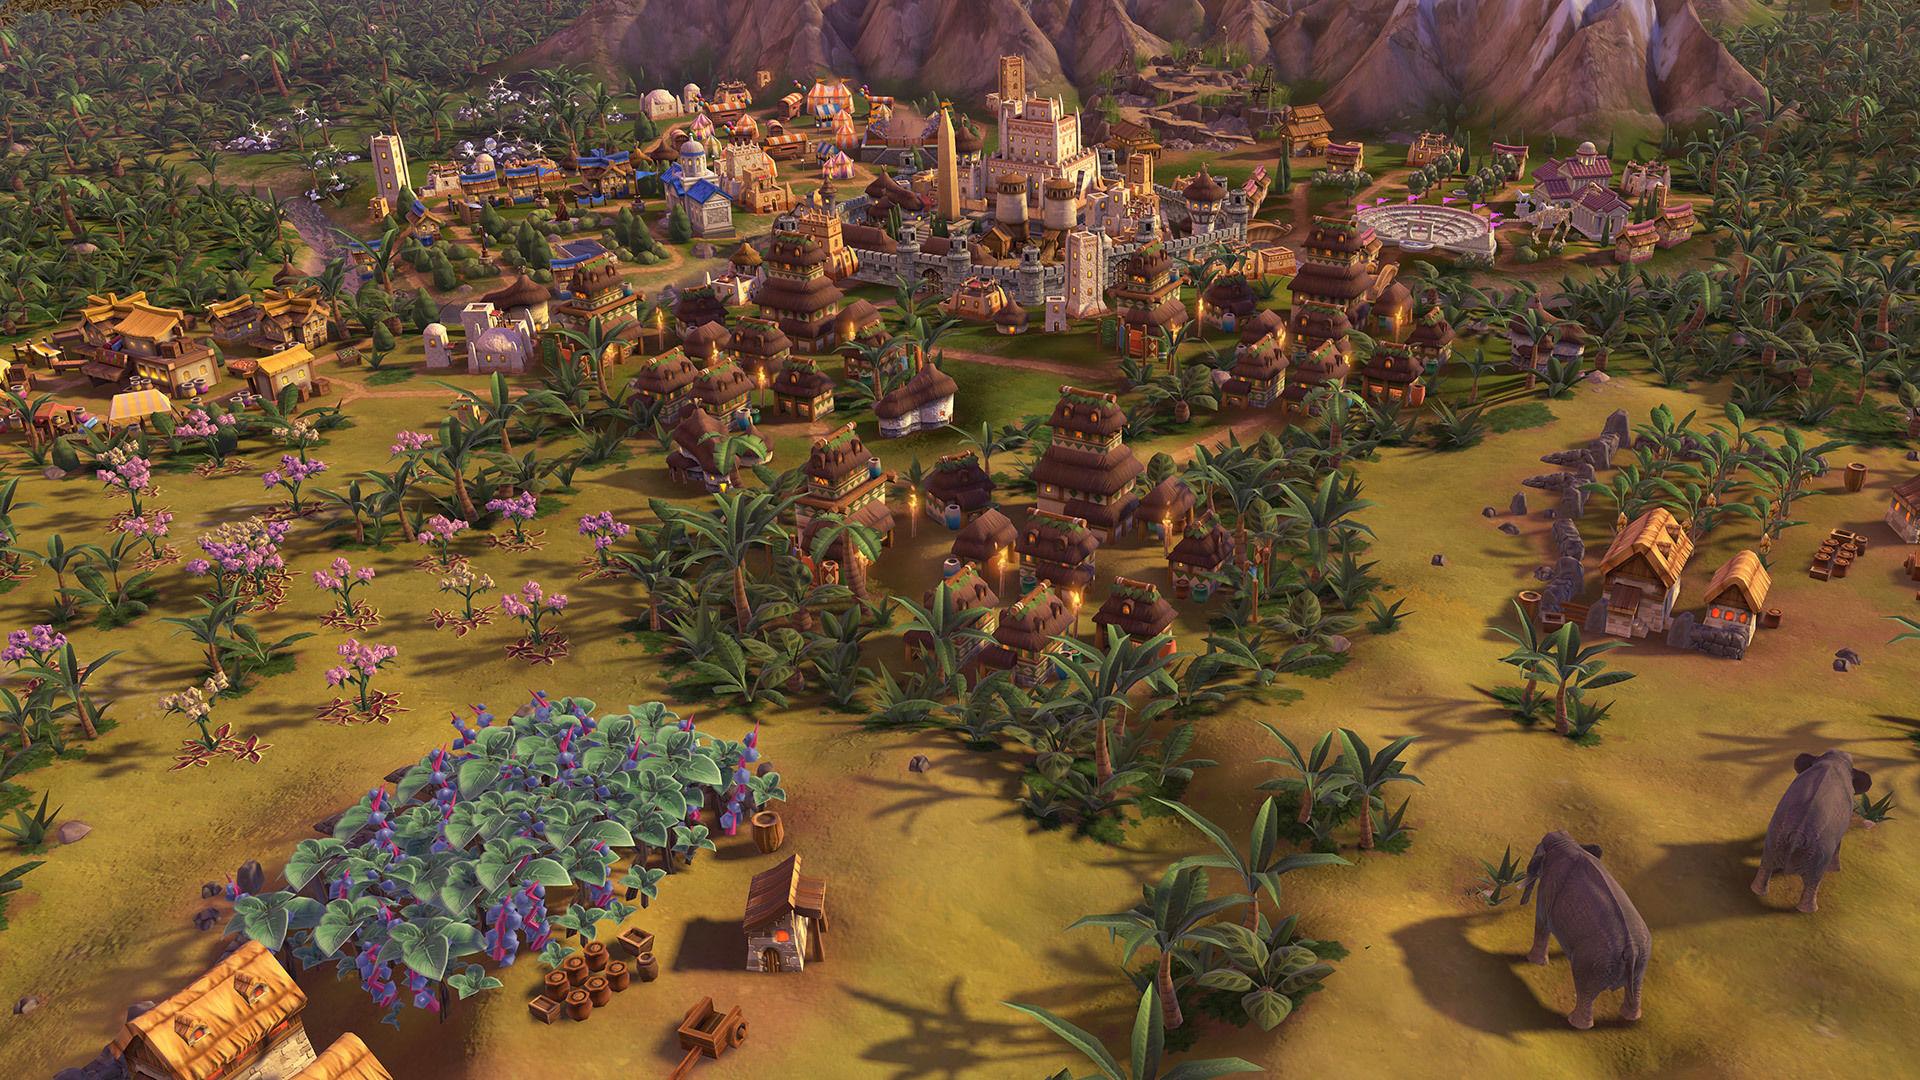 Sid meier's civilization vi | macosx free download | macgames-download.